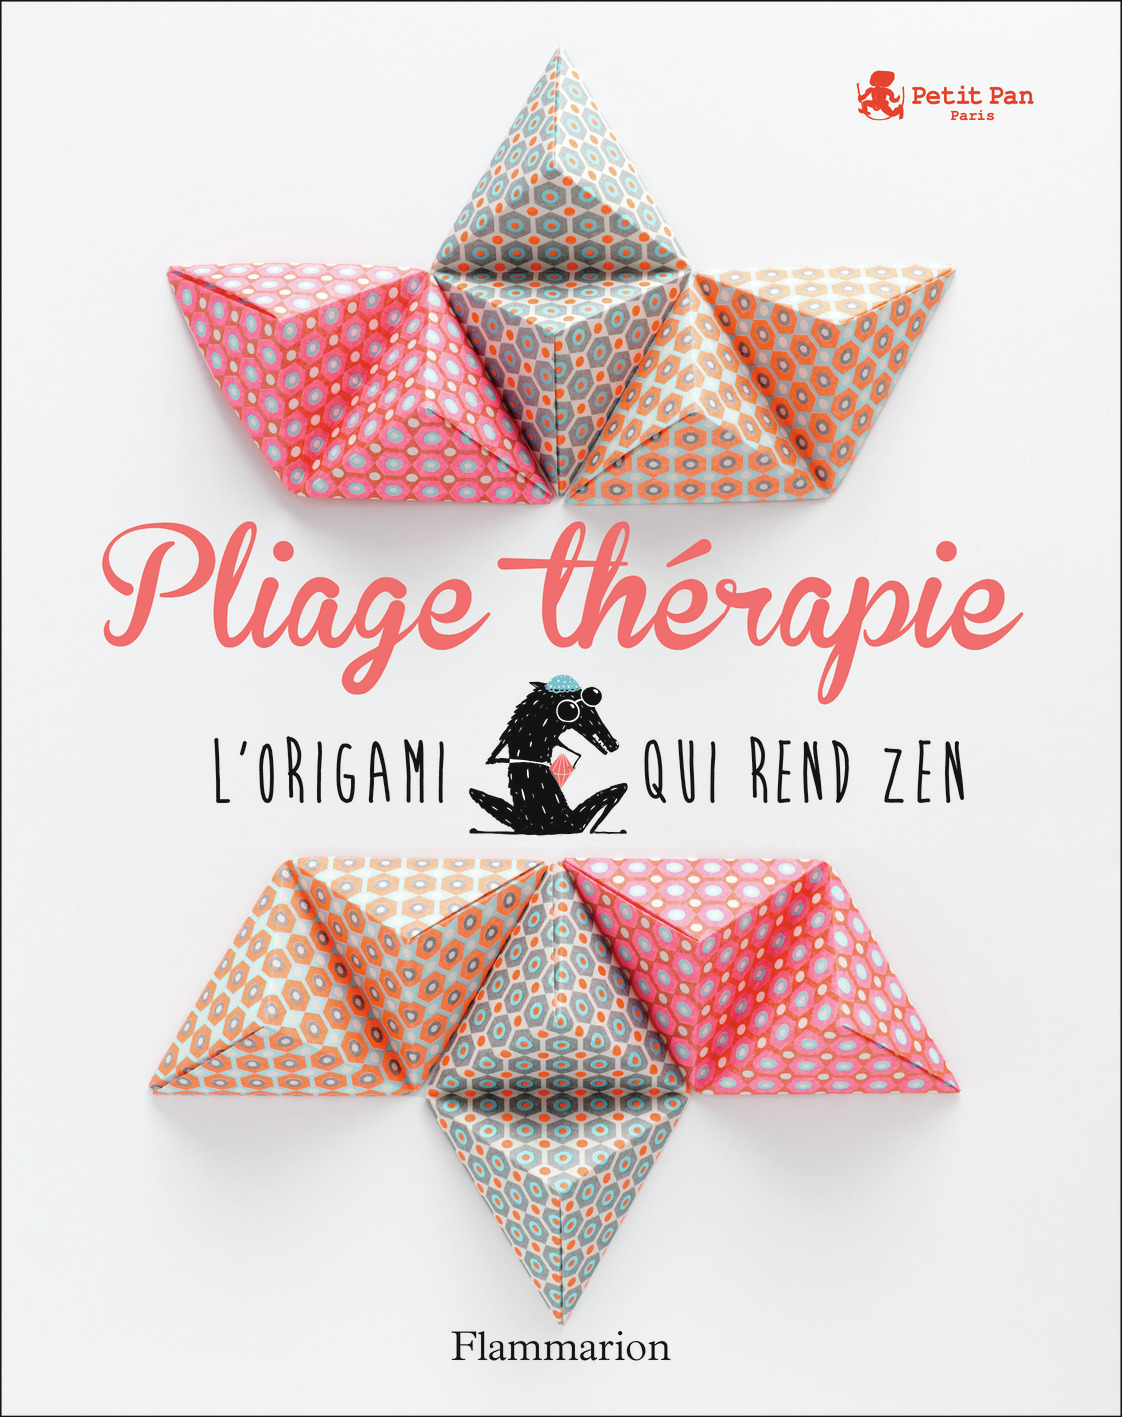 PLIAGE THERAPIE